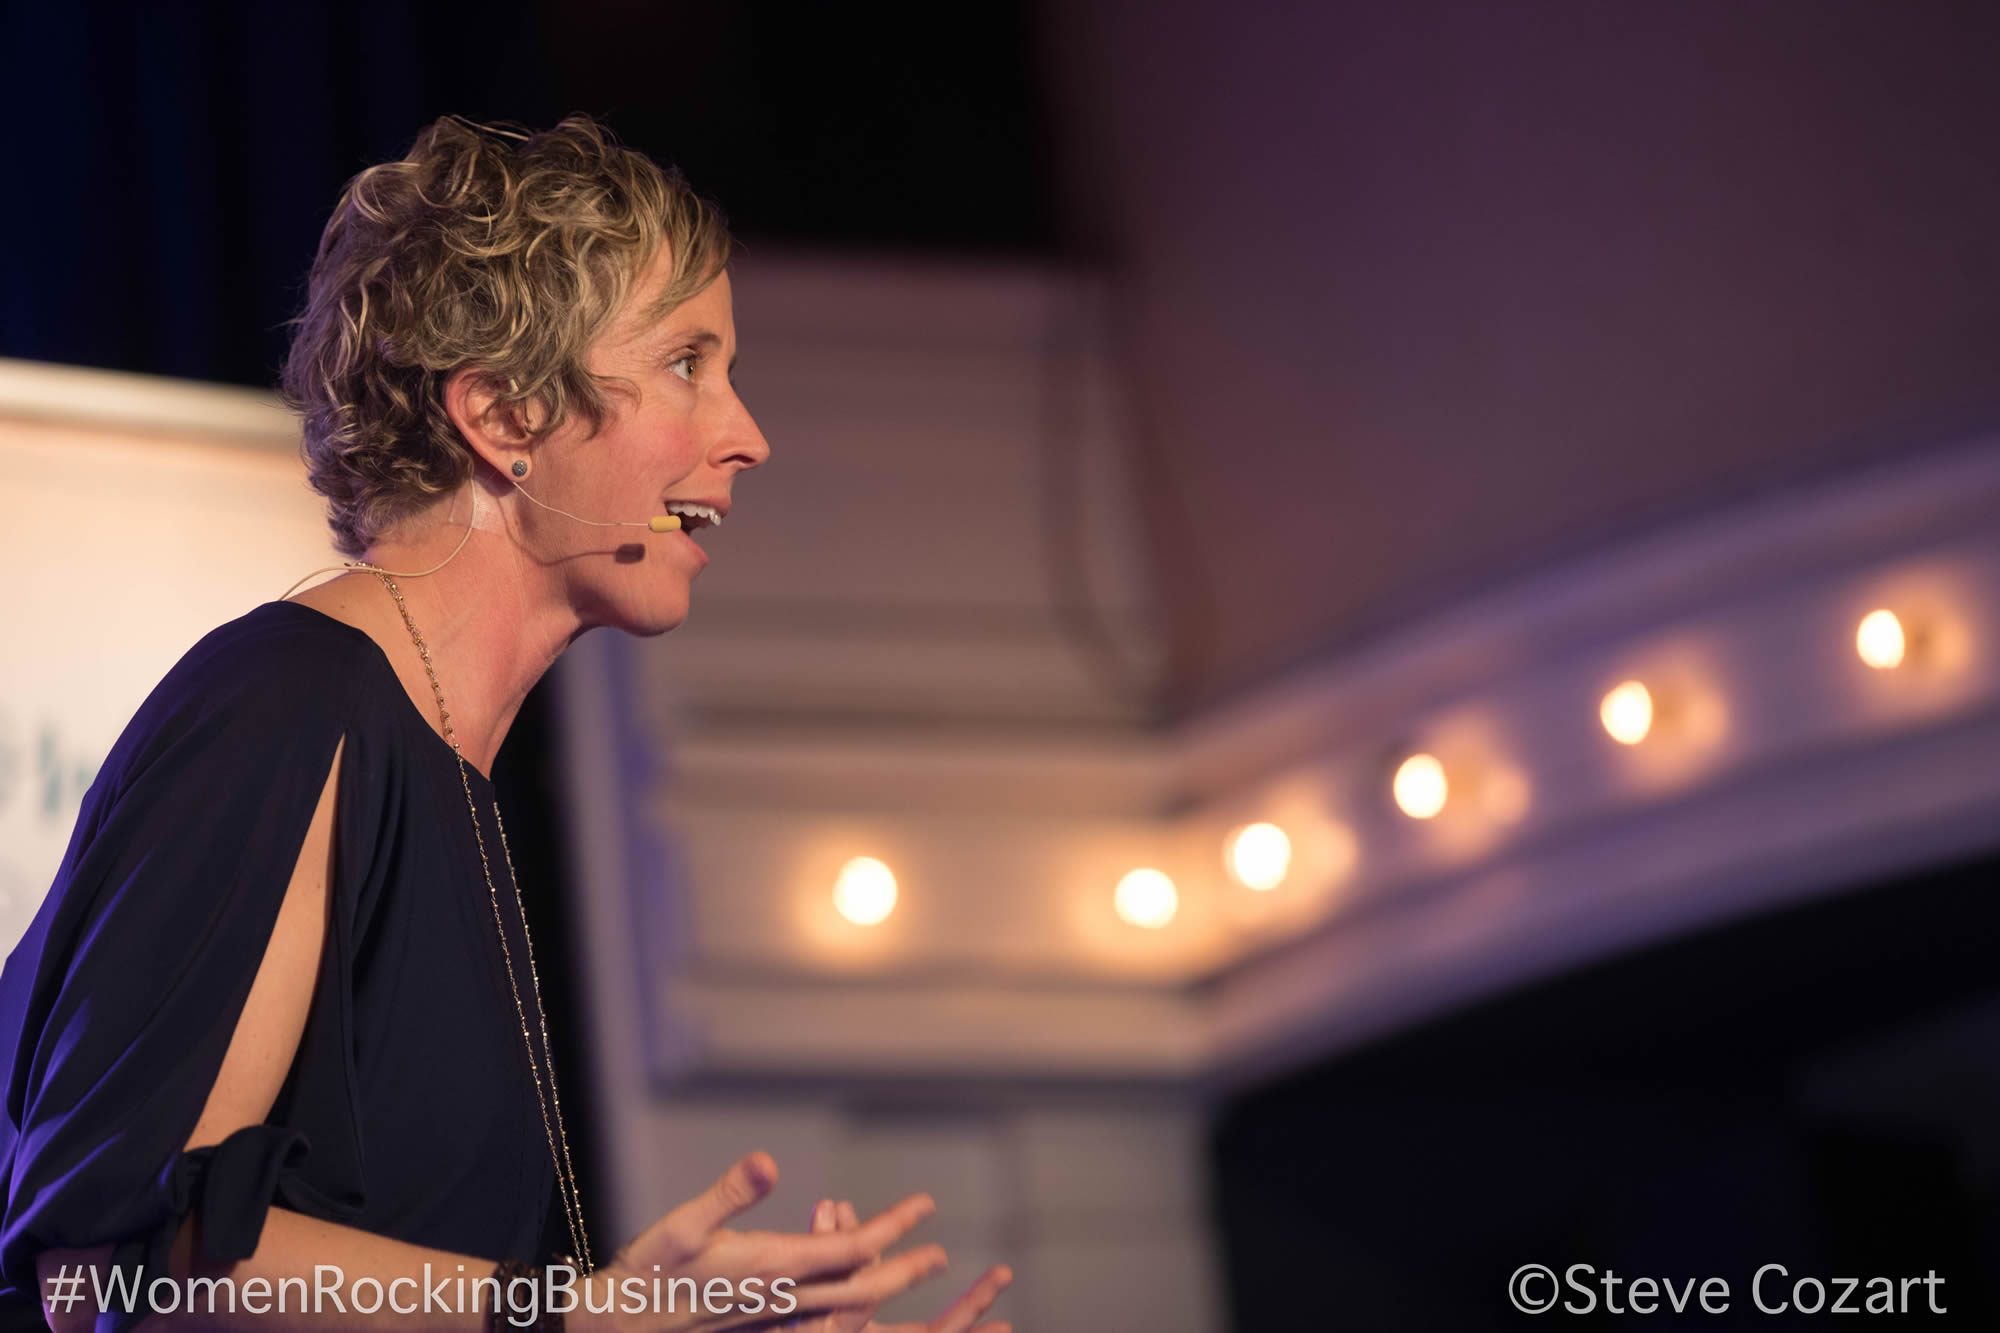 10 Top Secrets to Lead Profitable Workshops & Events